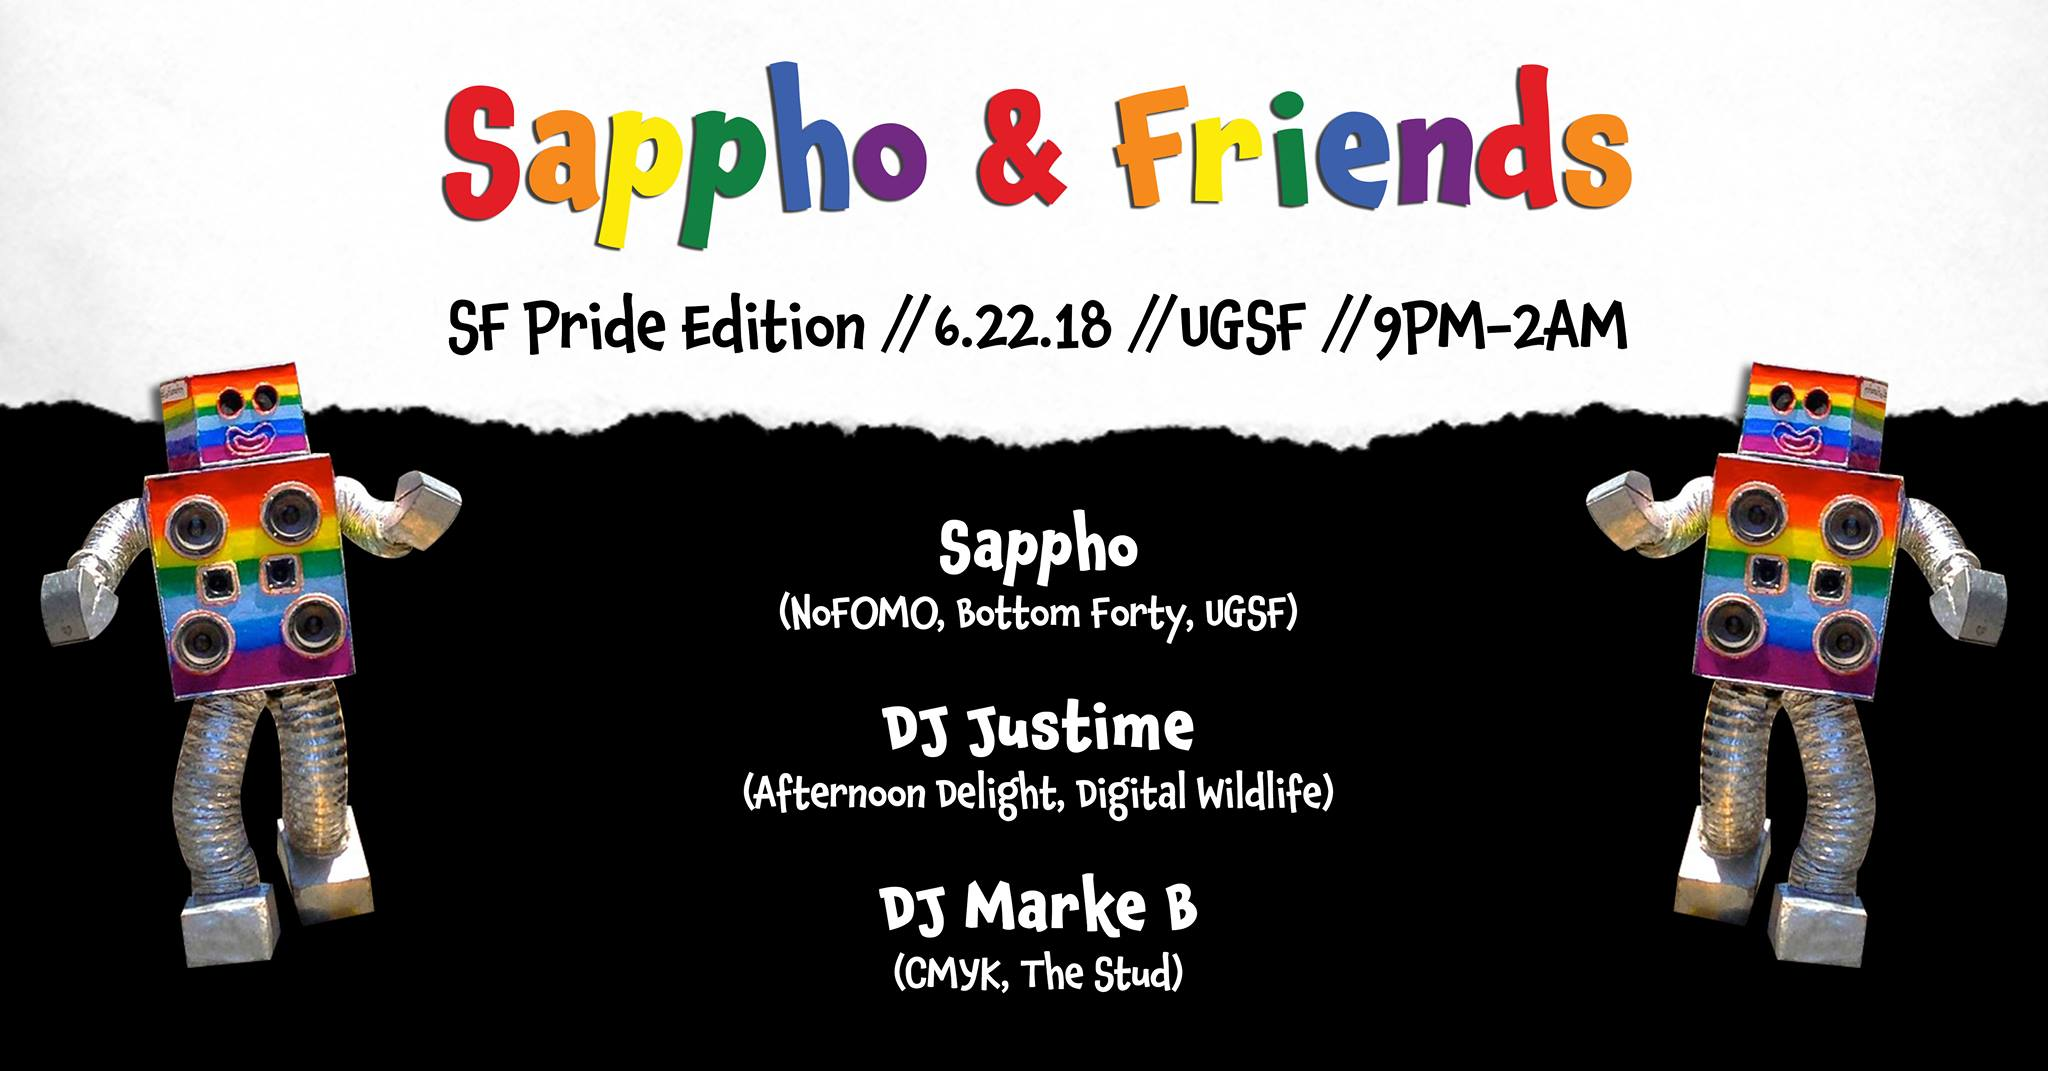 Sappho & Friends Pride w/ DJ Justime & Marke B